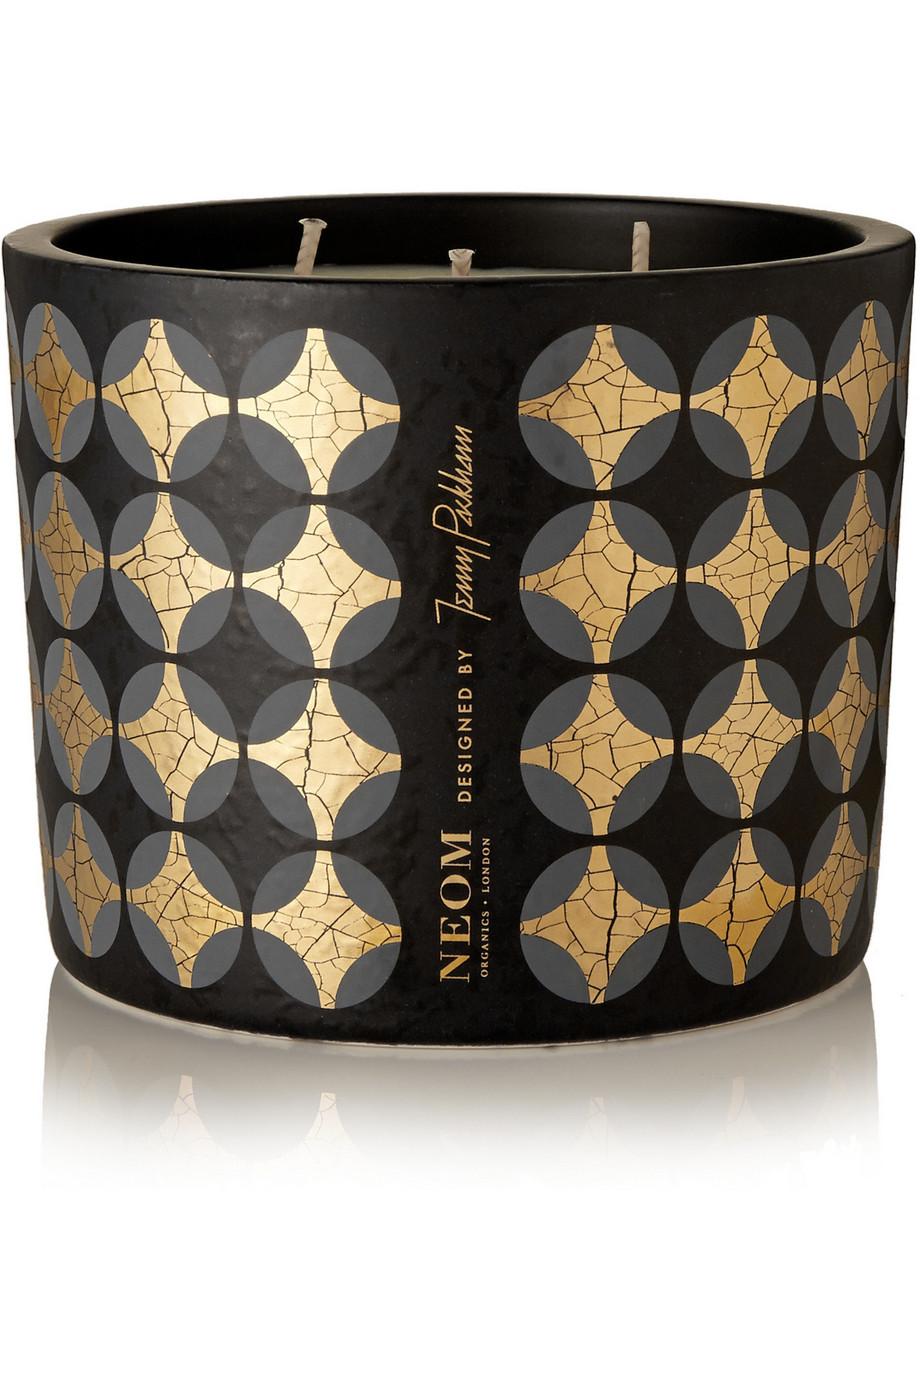 Neom Organics + Jenny Packham Real Luxury Lavender, Jasmine and Brazilian Rosewood Scented Candle, 390g